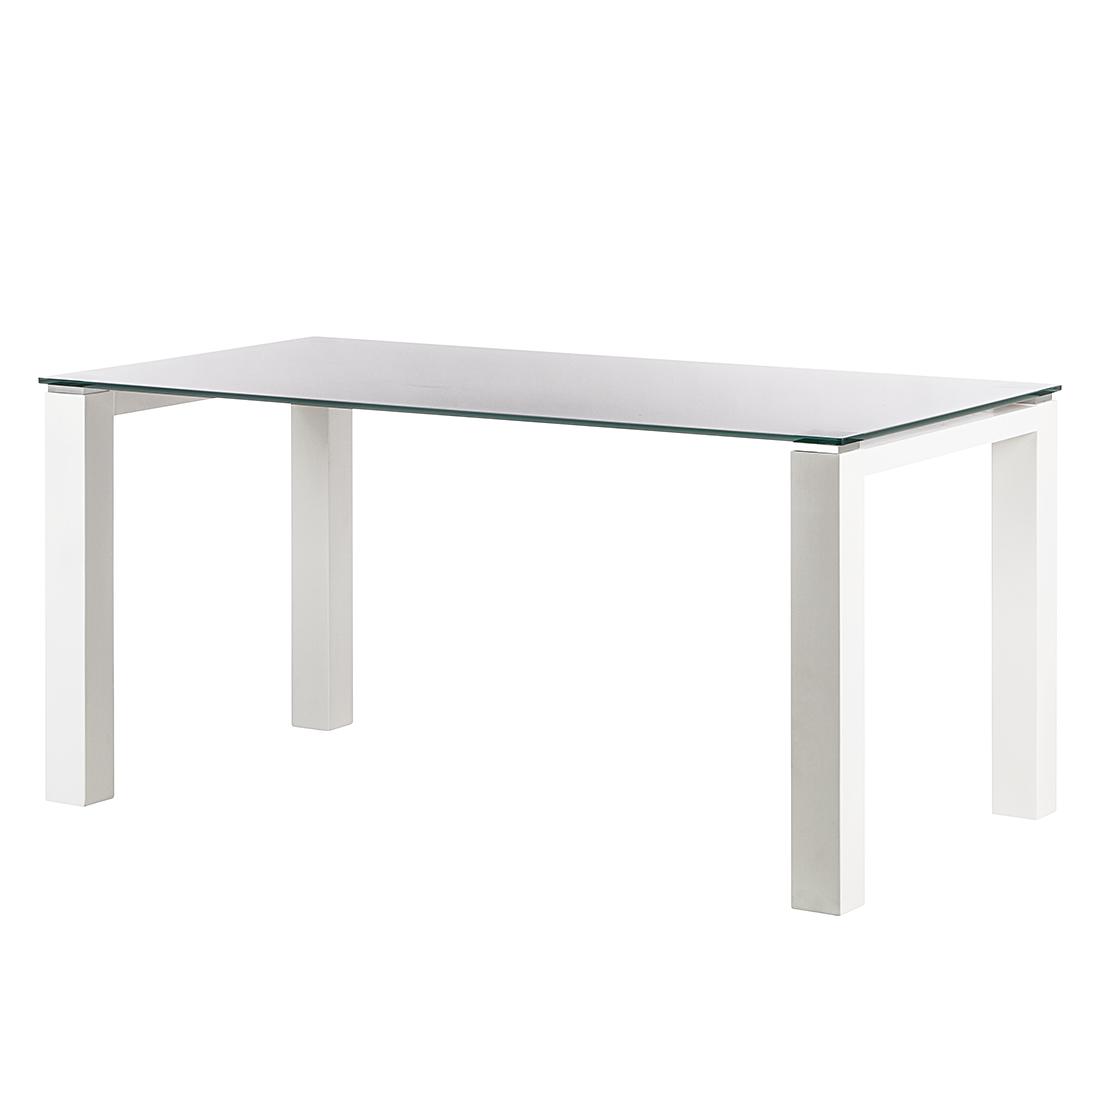 Niehoff Glazen tafel Palma - wit gelakt glas/wit (Afmetingen: 90x90cm) Home24